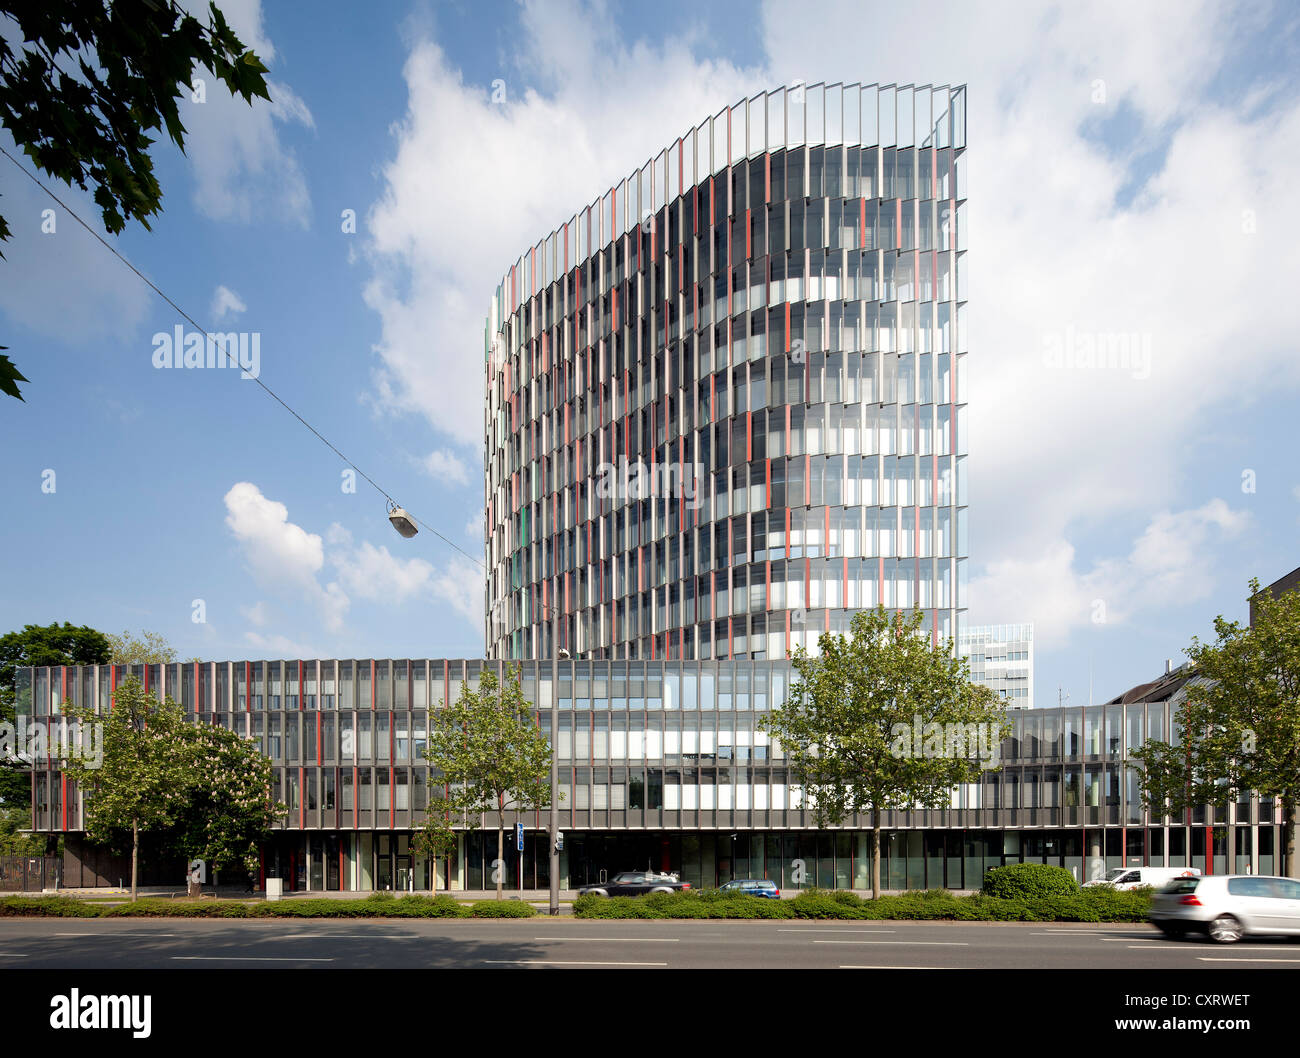 kfw westarkade office building frankfurt am main hesse stock photo royalty free image. Black Bedroom Furniture Sets. Home Design Ideas